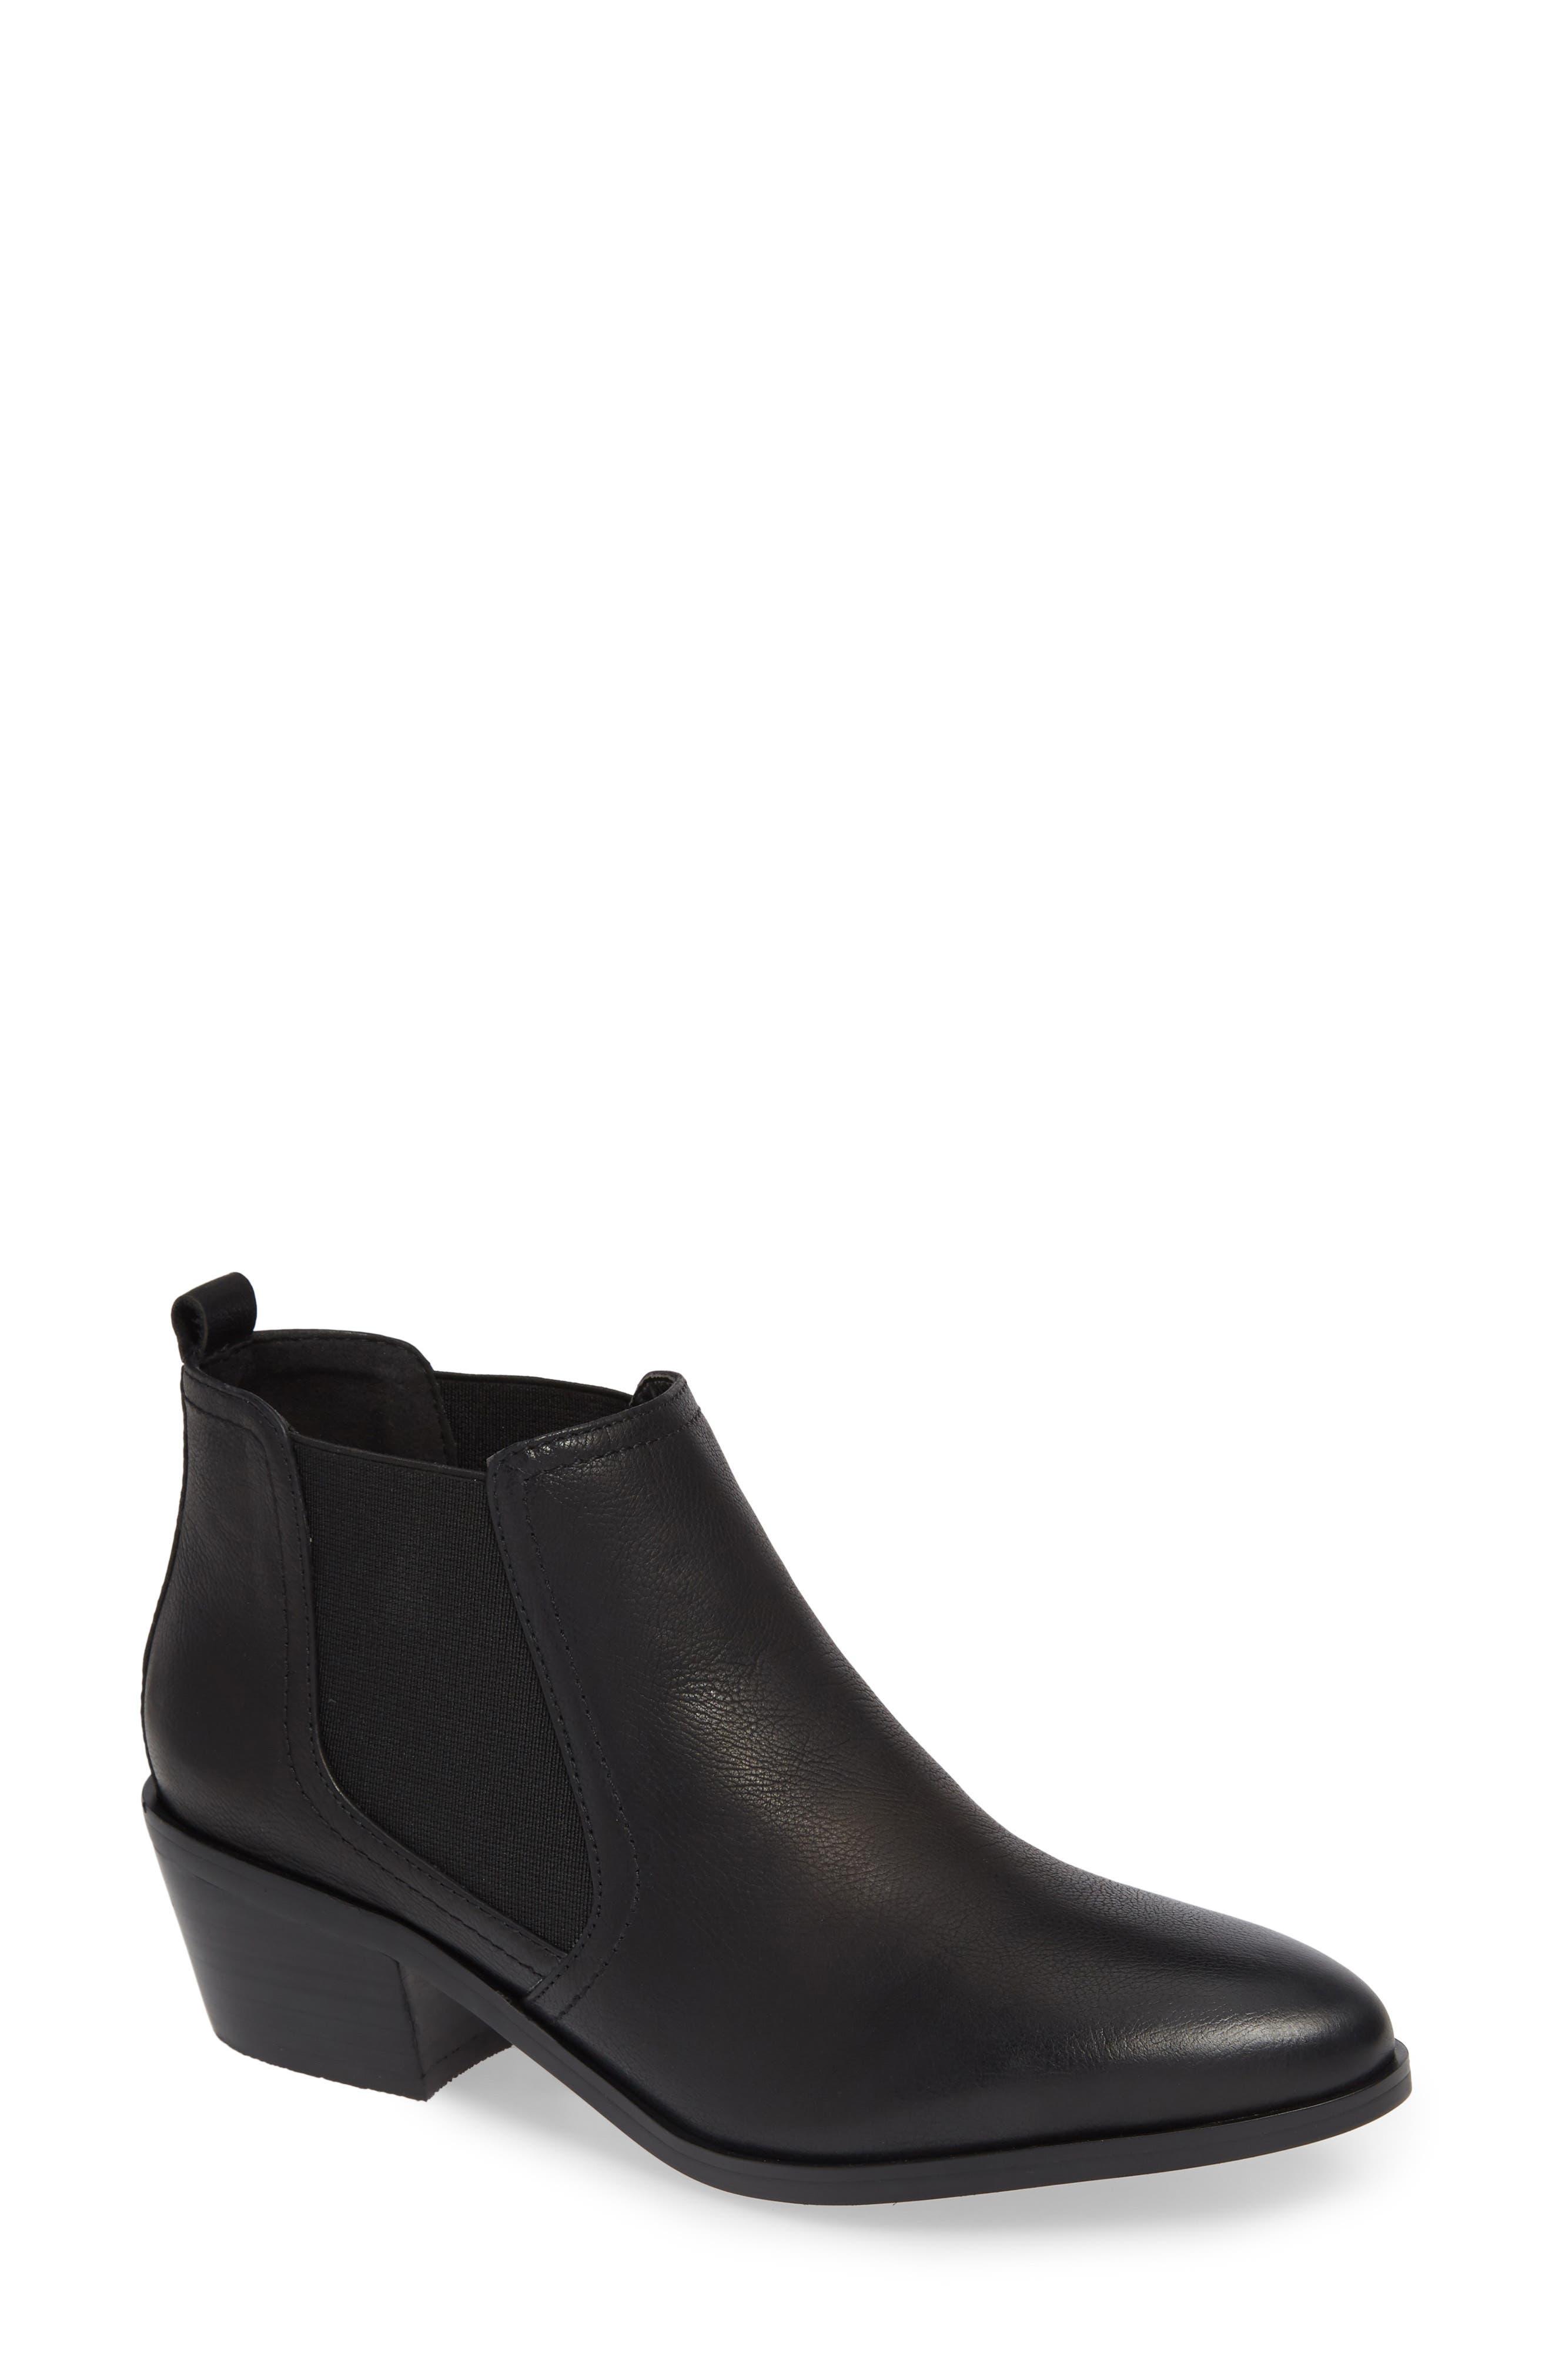 DAVID TATE Maxie Chelsea Boot, Main, color, BLACK LEATHER